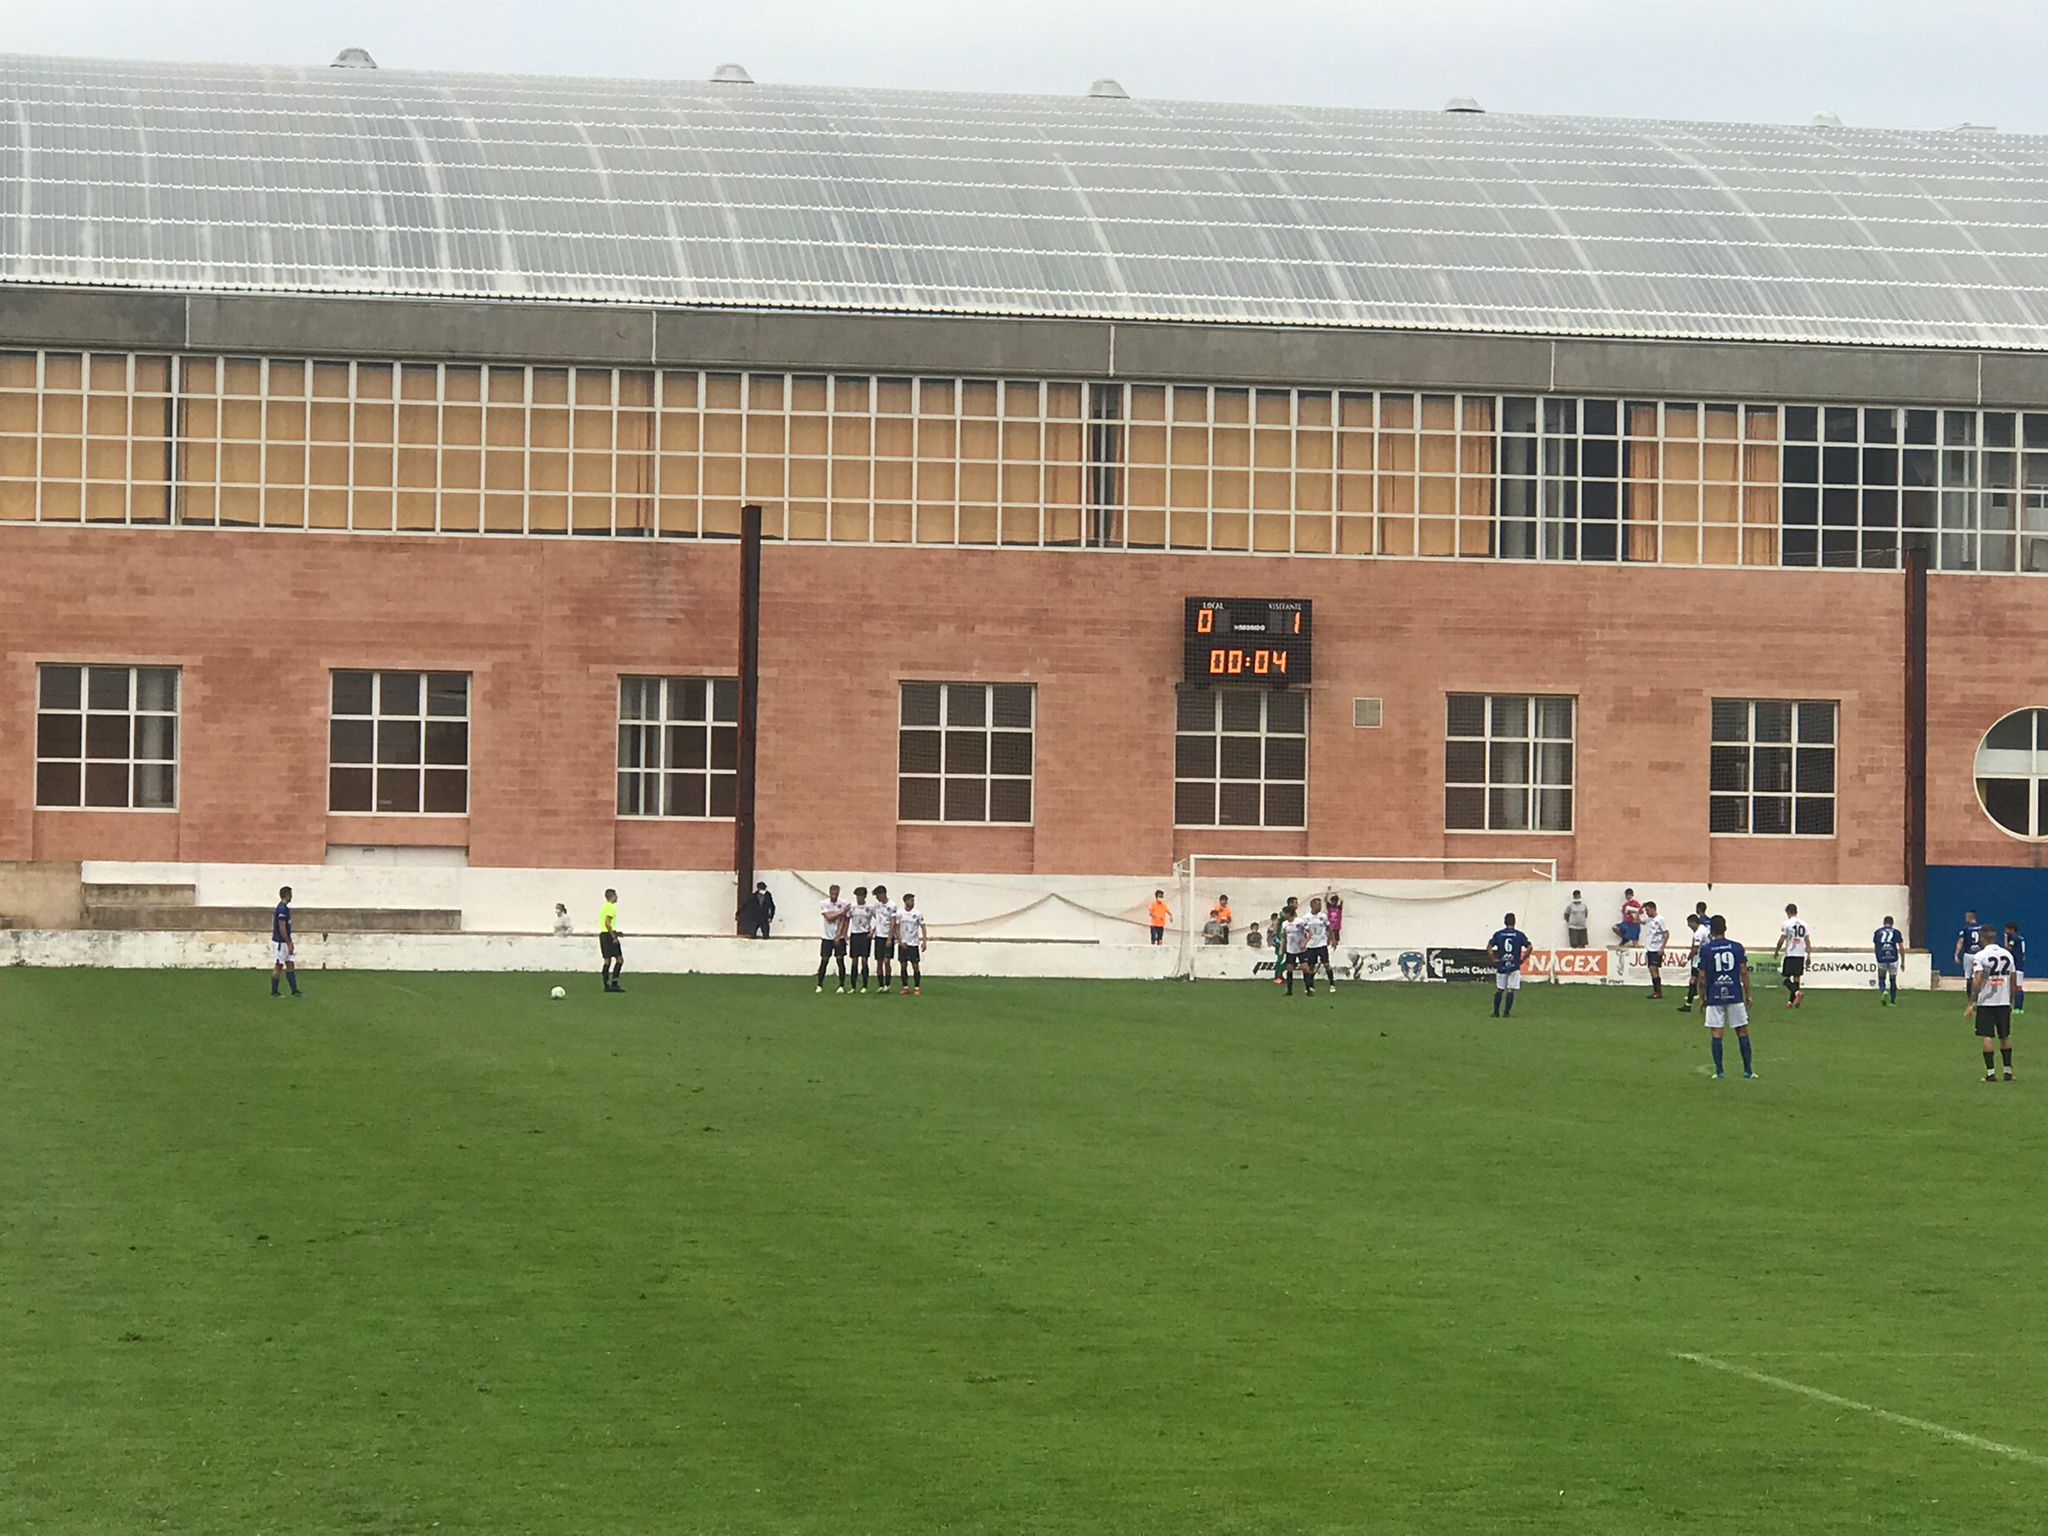 Villena 3 - 1 Deportivo Ontinyent